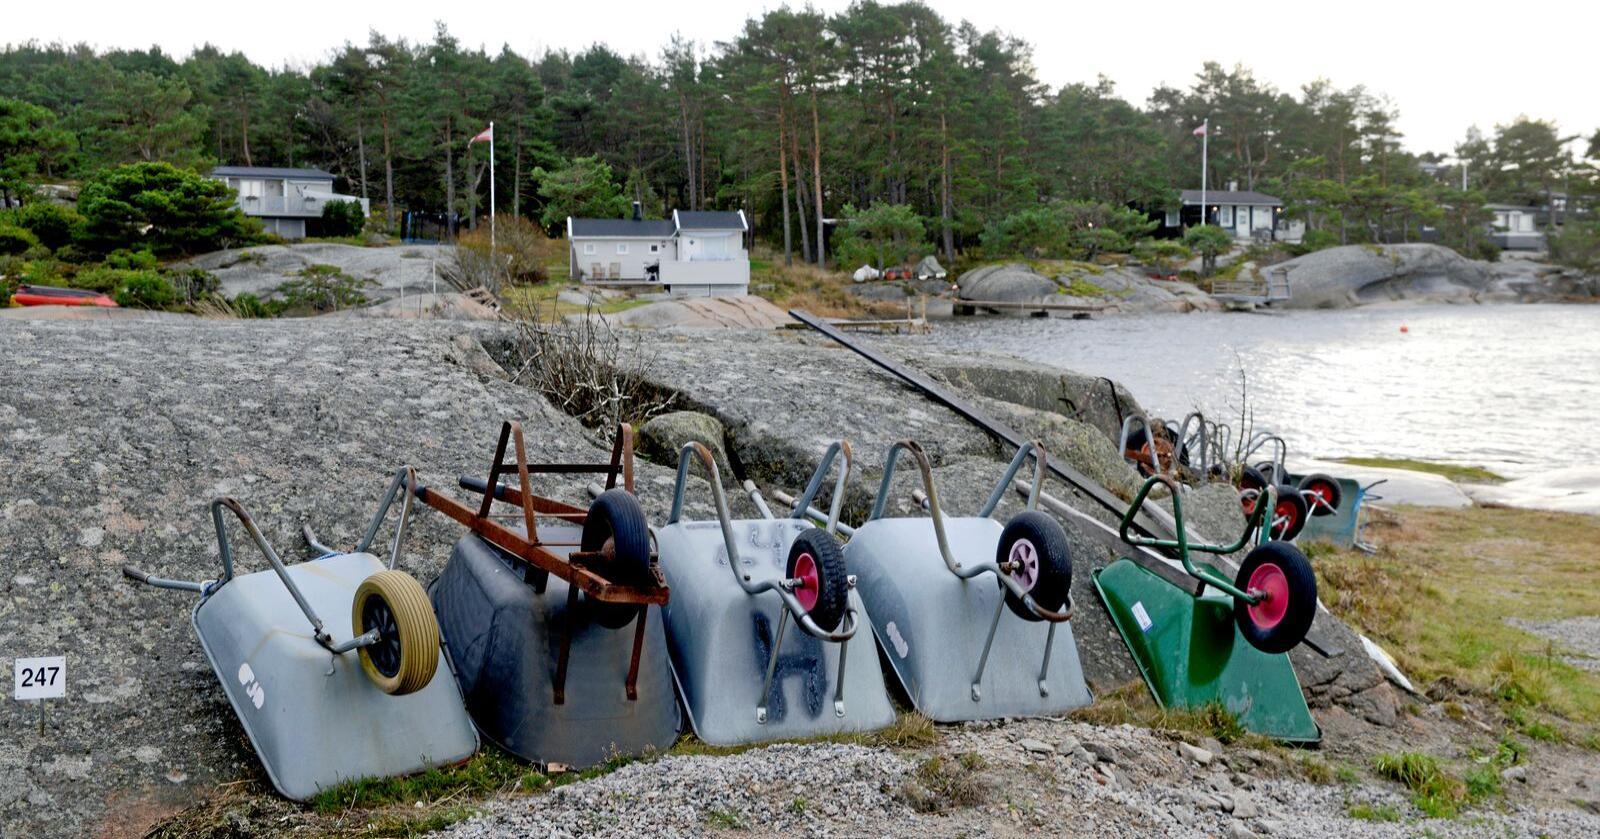 Hvaler kommune har 4300 fritidsboliger. Foto: Mariann Tvete